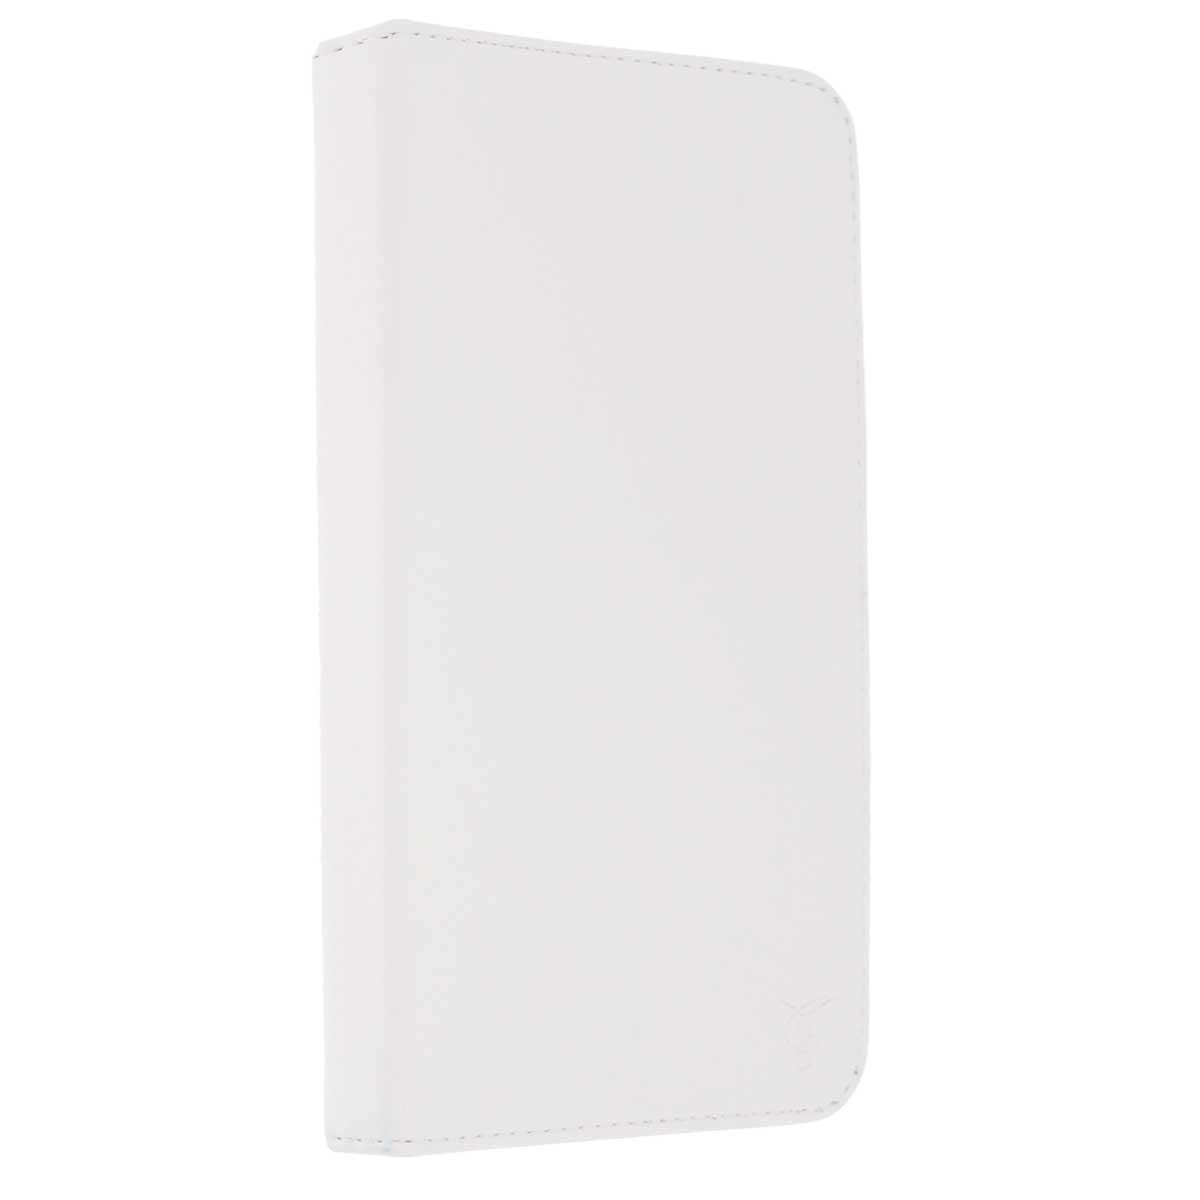 Vivacase Basic чехол для Asus MeMO Pad 7